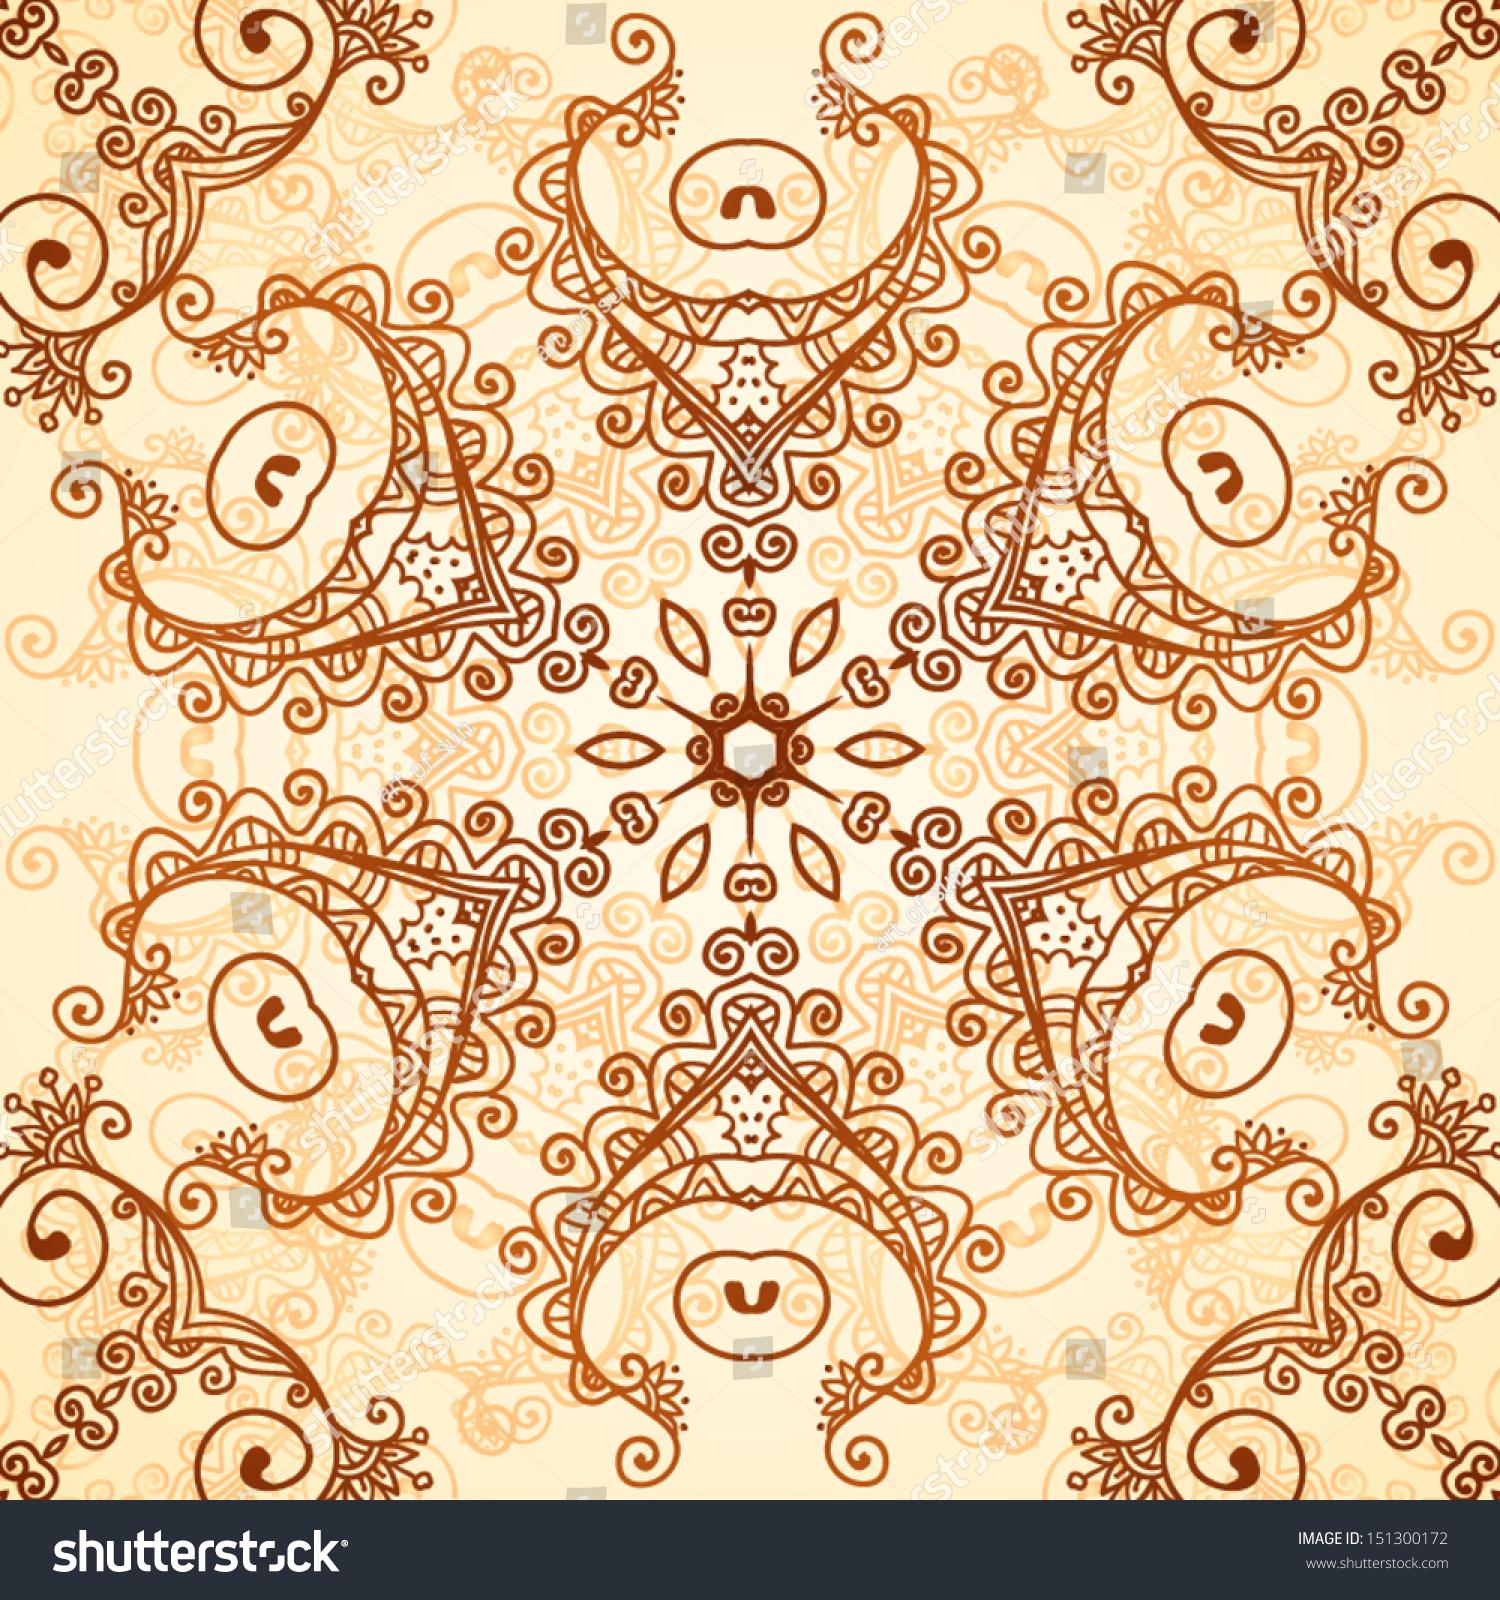 Ornate vintage vector background in mehndi style royalty free stock - Ornate Vintage Circle Background In Mehndi Style